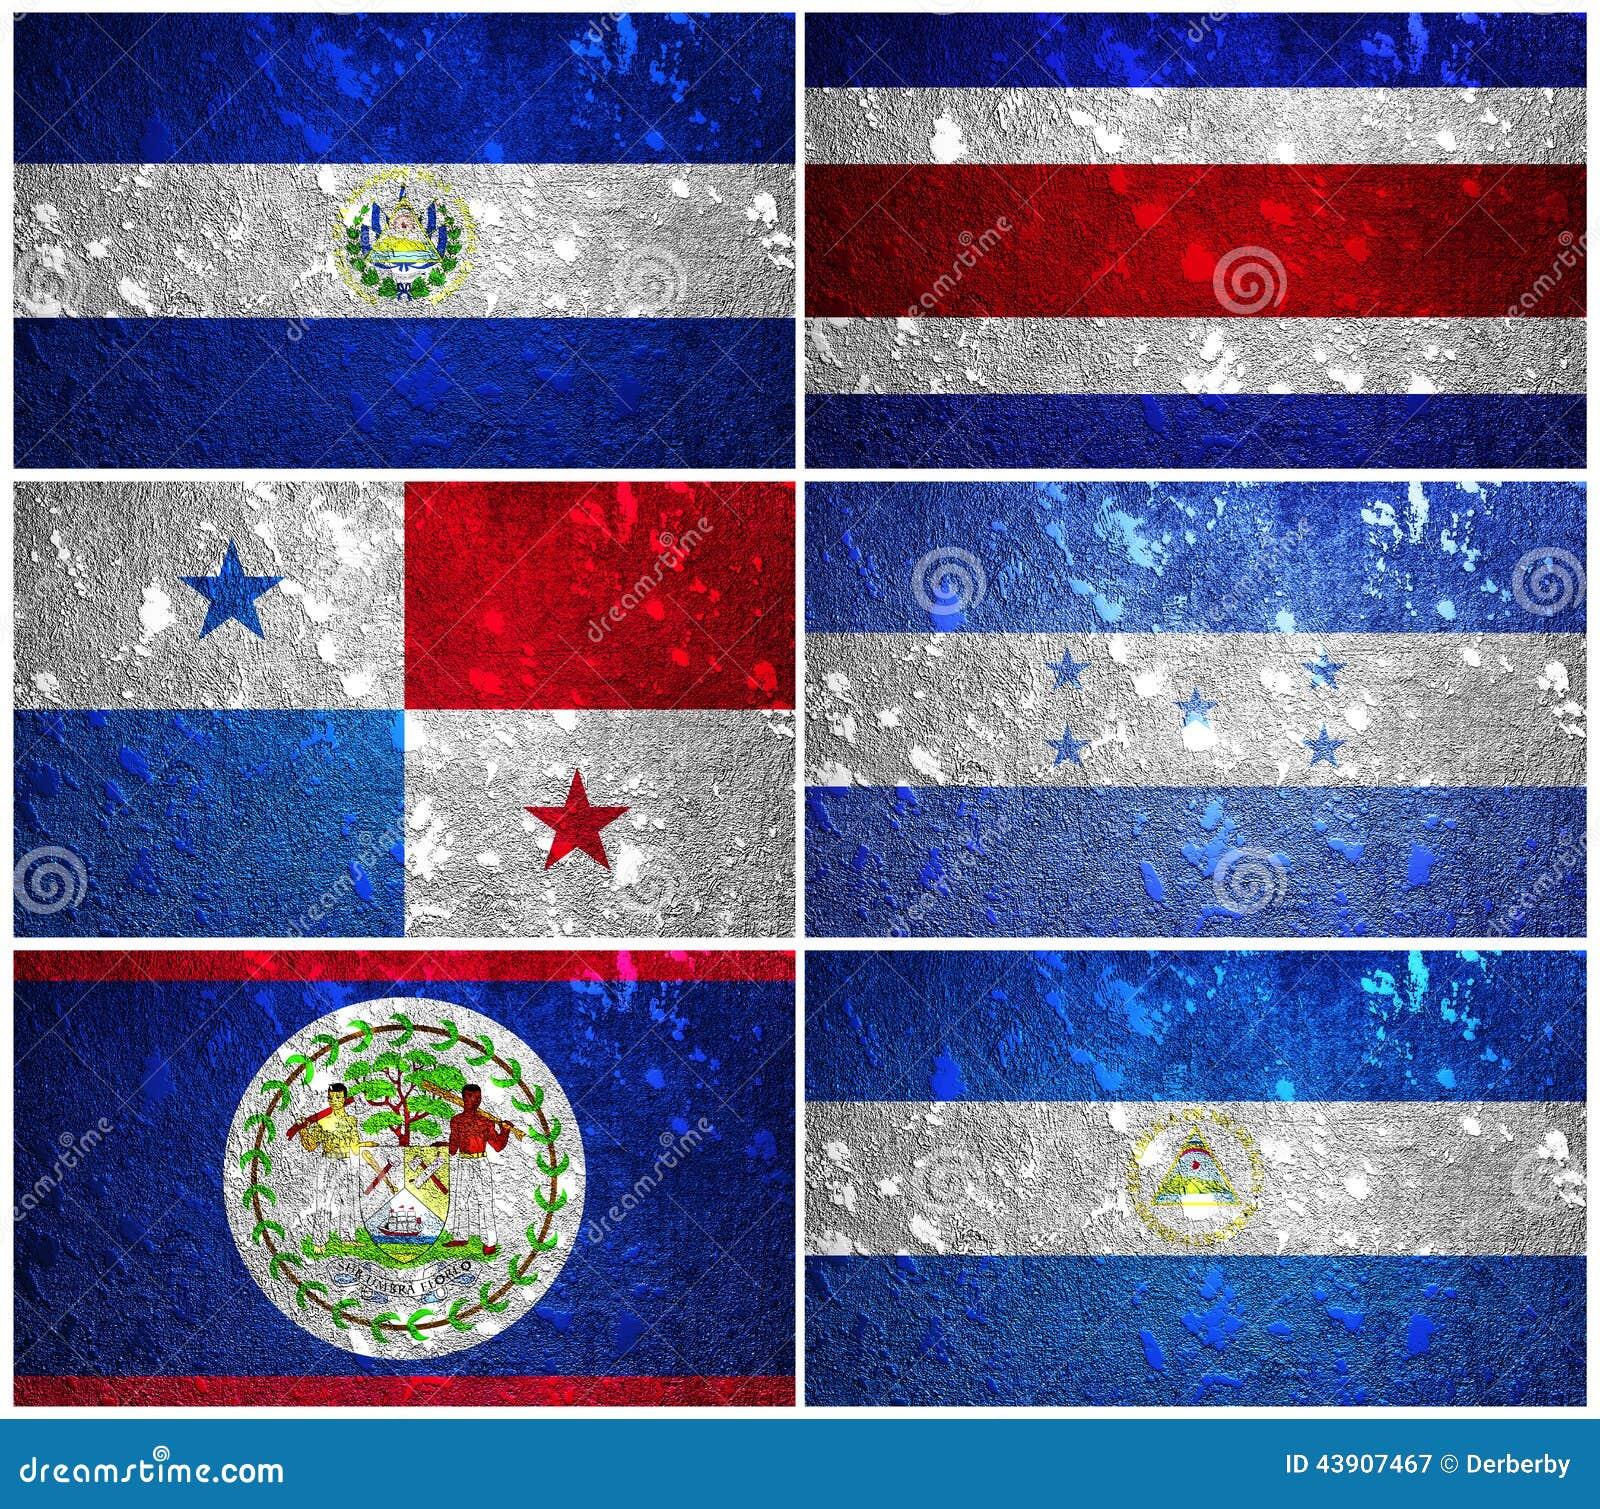 Panama Belize El Salvador Honduras Nicaragua And Costa Rica Flags Of Wall Texture